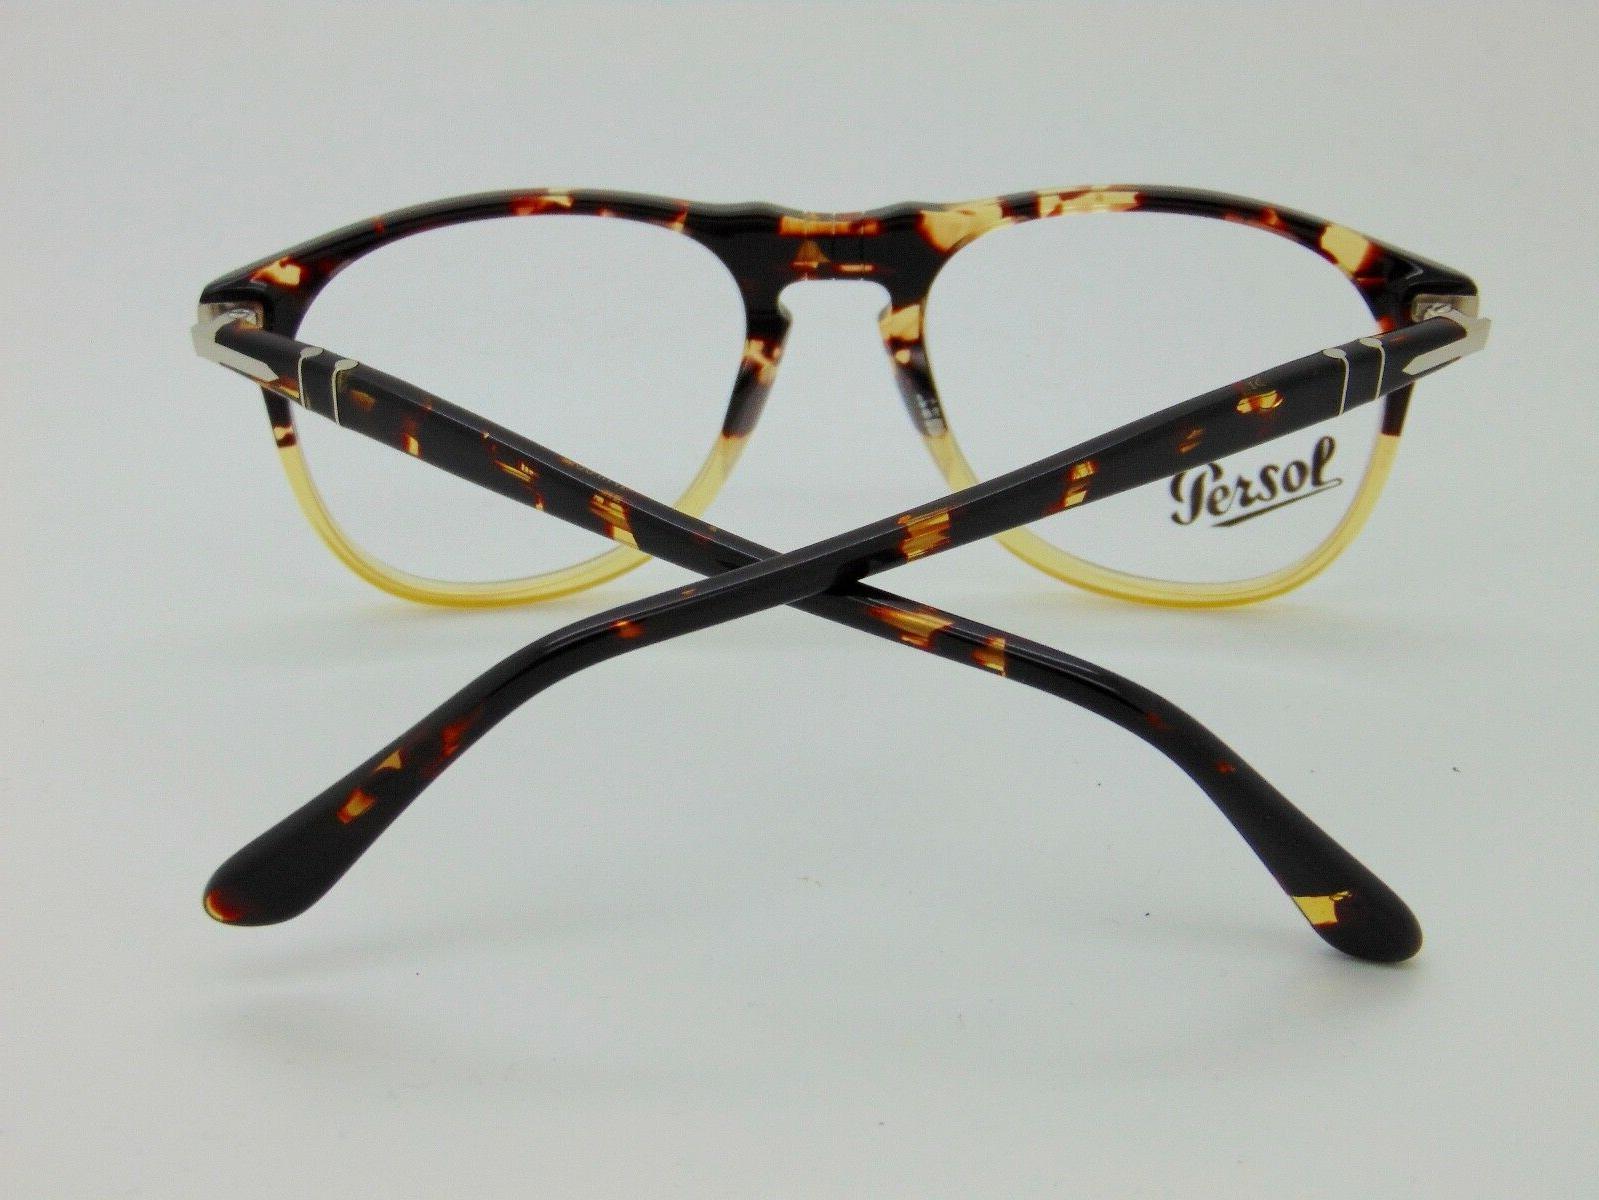 New Authentic 1024 Ebano Aviator Eyeglasses